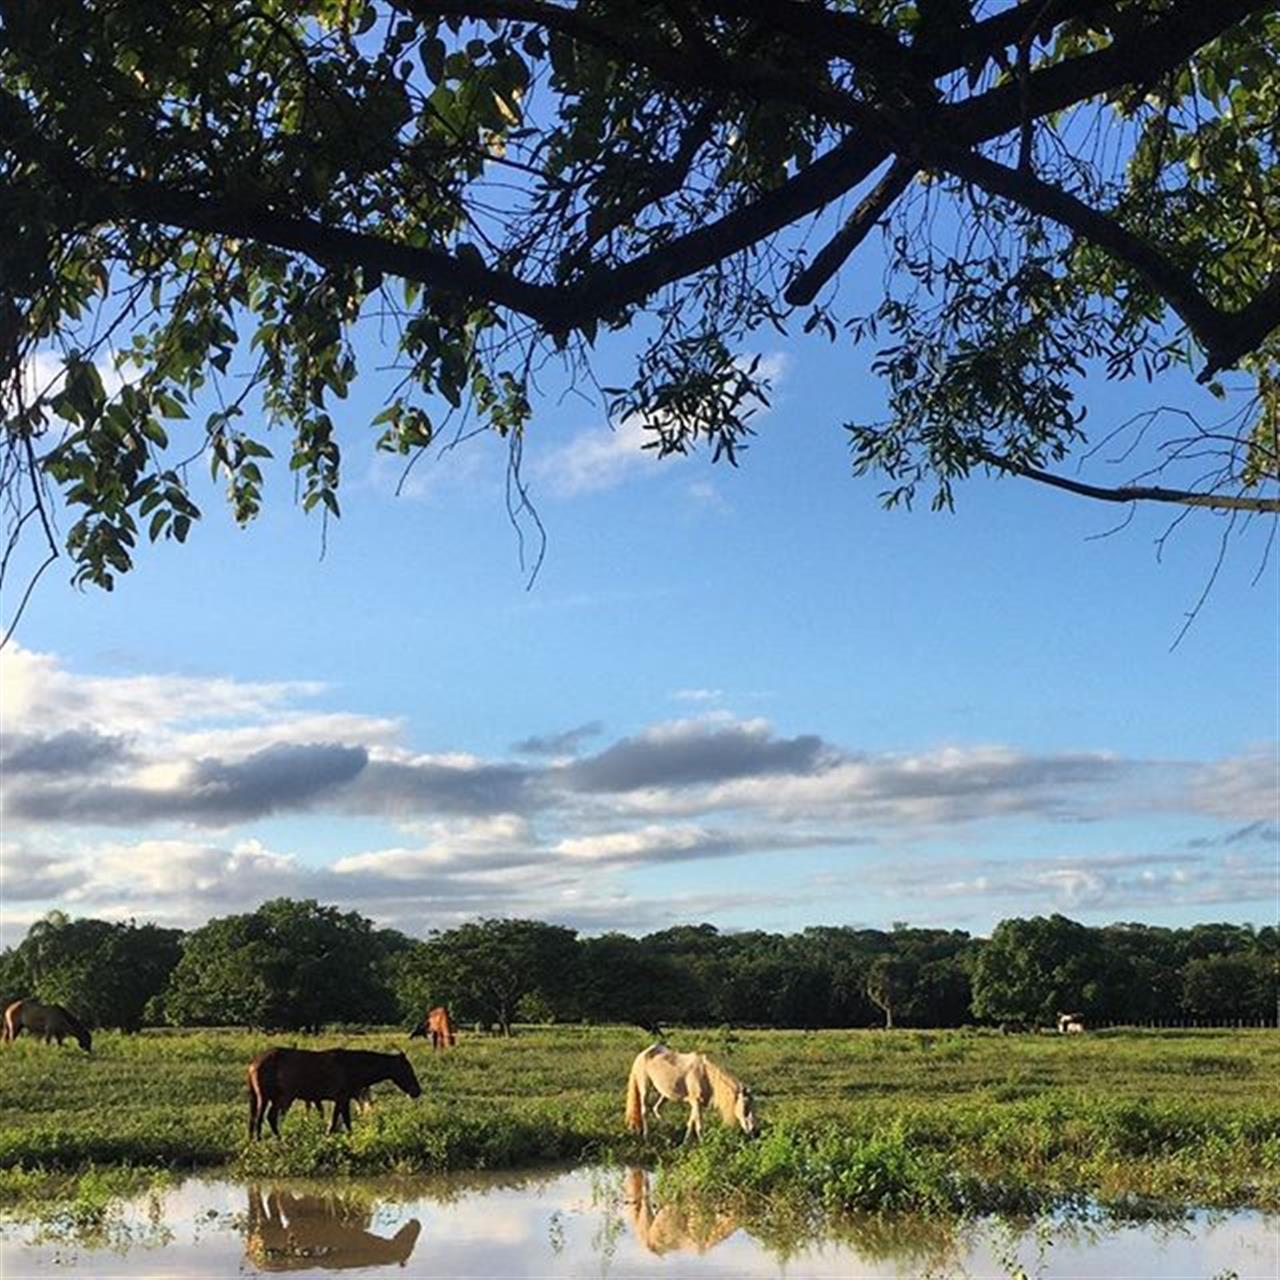 Happy Horses ? #horses #lovehorses #Caribbean #farmlife #farmhousestyle #farm #leadingrelocal www.selectcaribbean.com